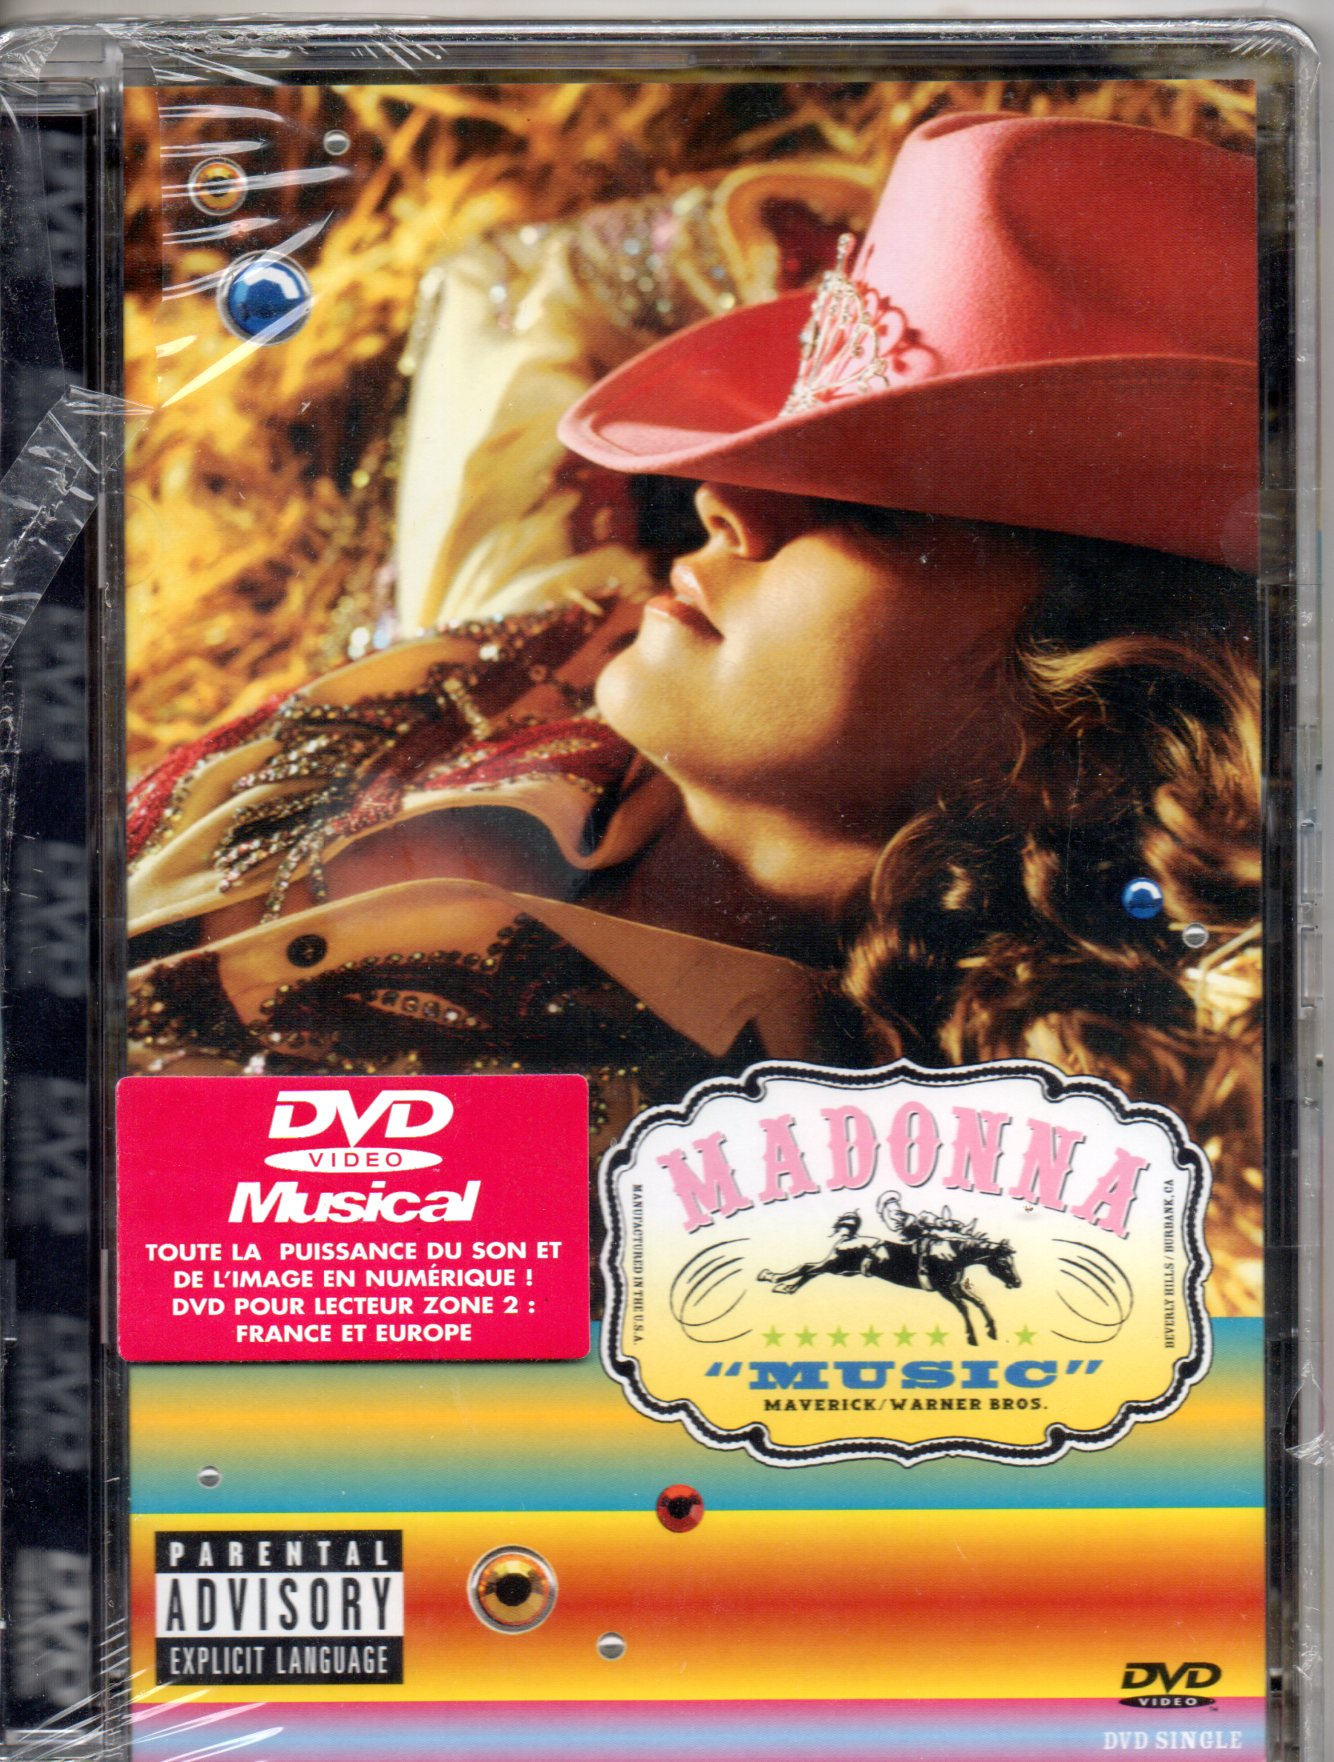 MADONNA - Erotica - CD